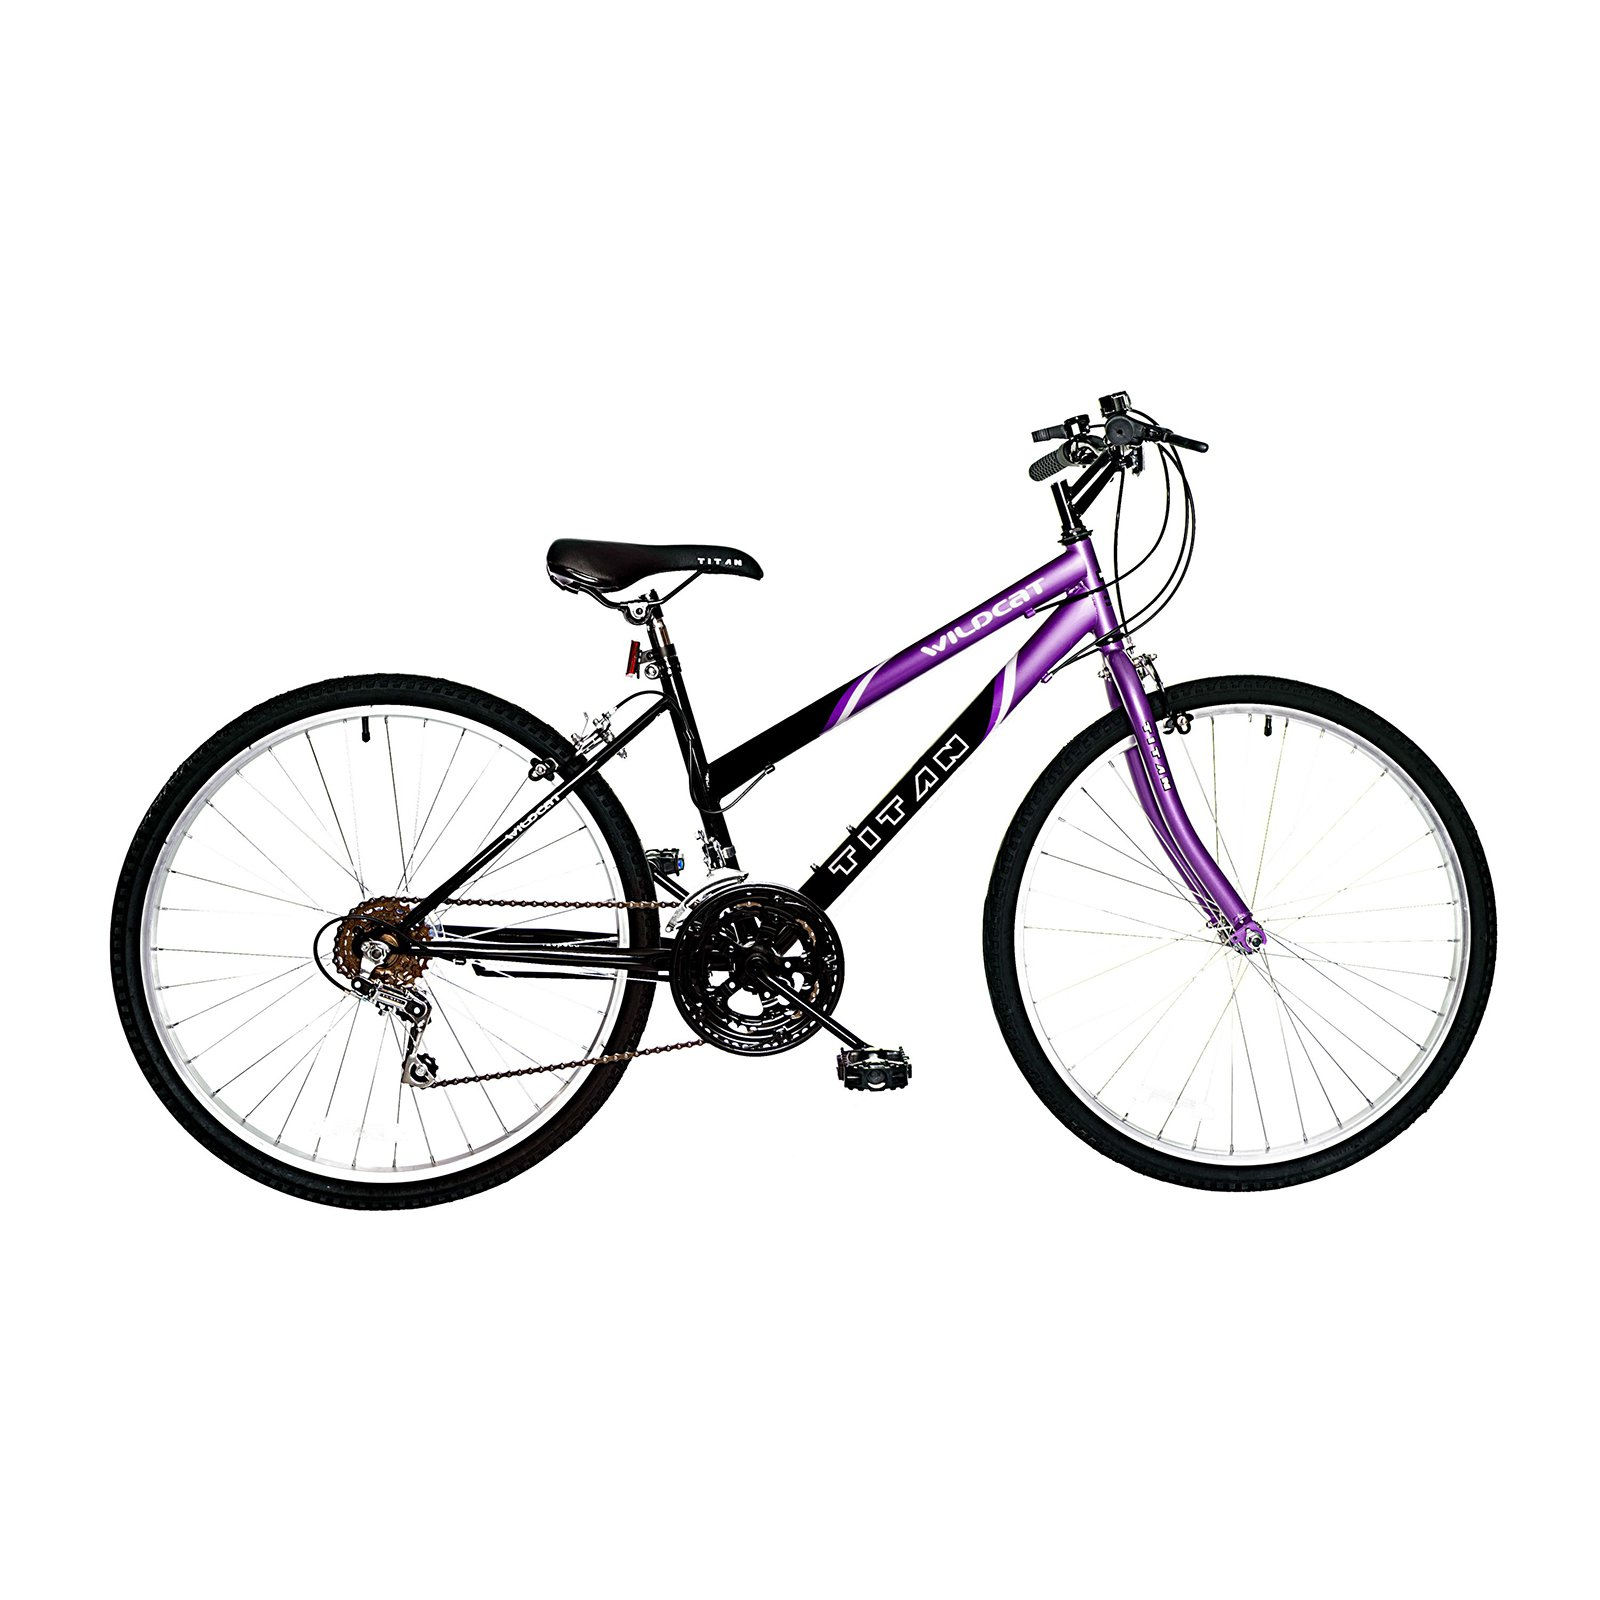 TITAN Wildcat 12-Speed Women's Mountain Bike, Purple & Black